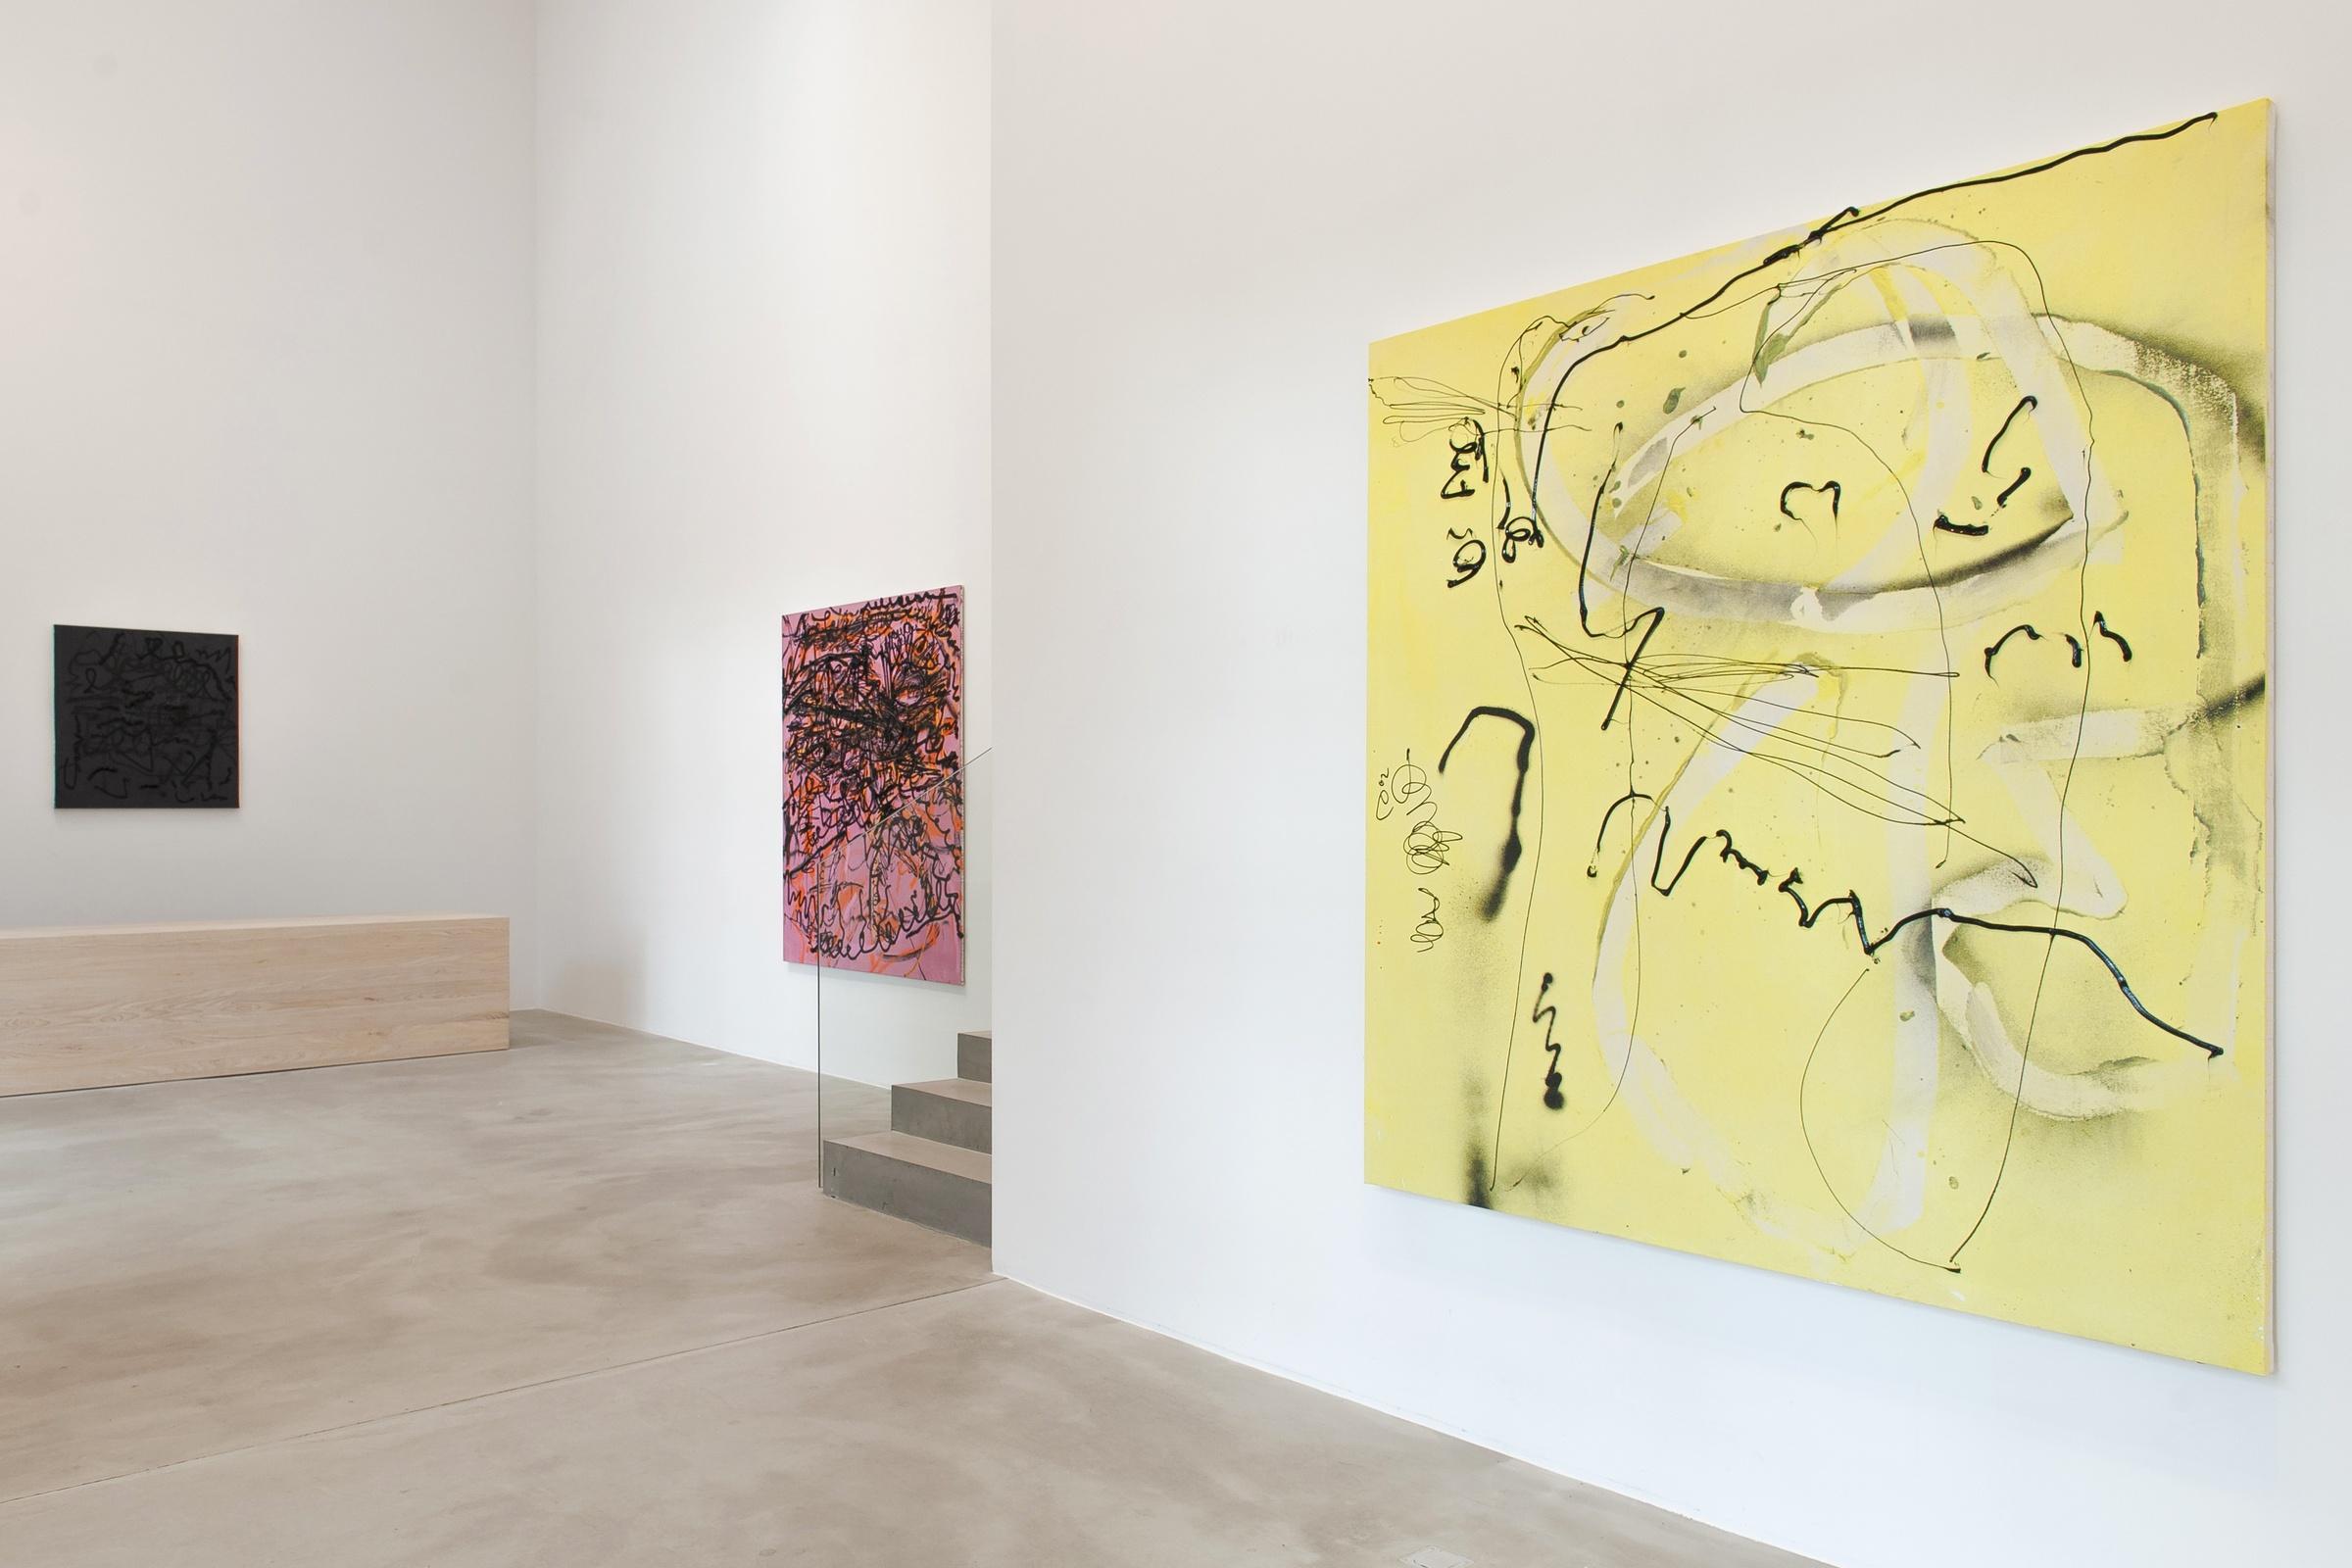 INSTALLATION VIEW | SAMI KORKIAKOSKI | Makasiini Contemporary